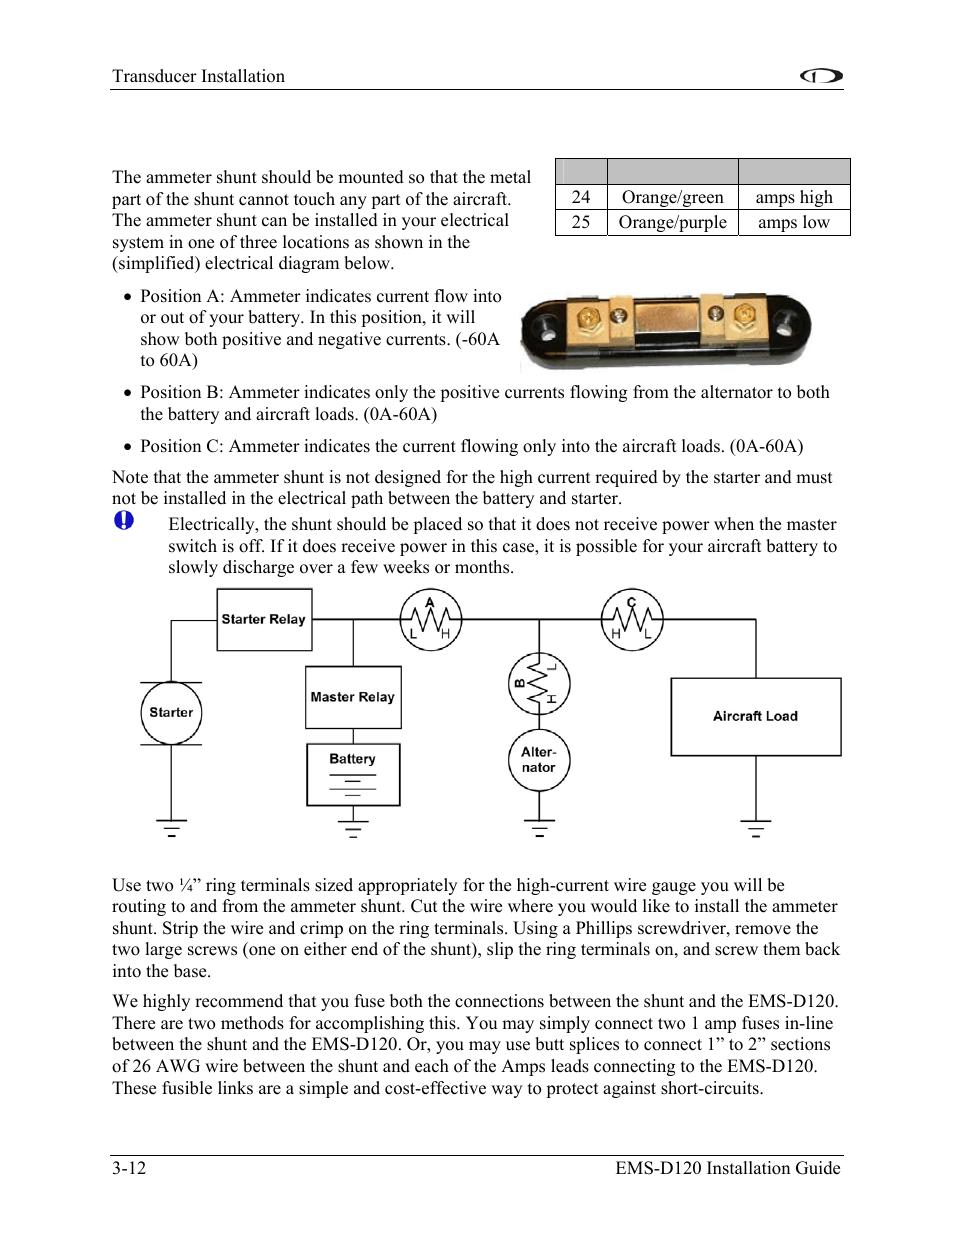 medium resolution of ammeter shunt ammeter shunt 12 dynon avionics ems d120 installation guide user manual page 26 70